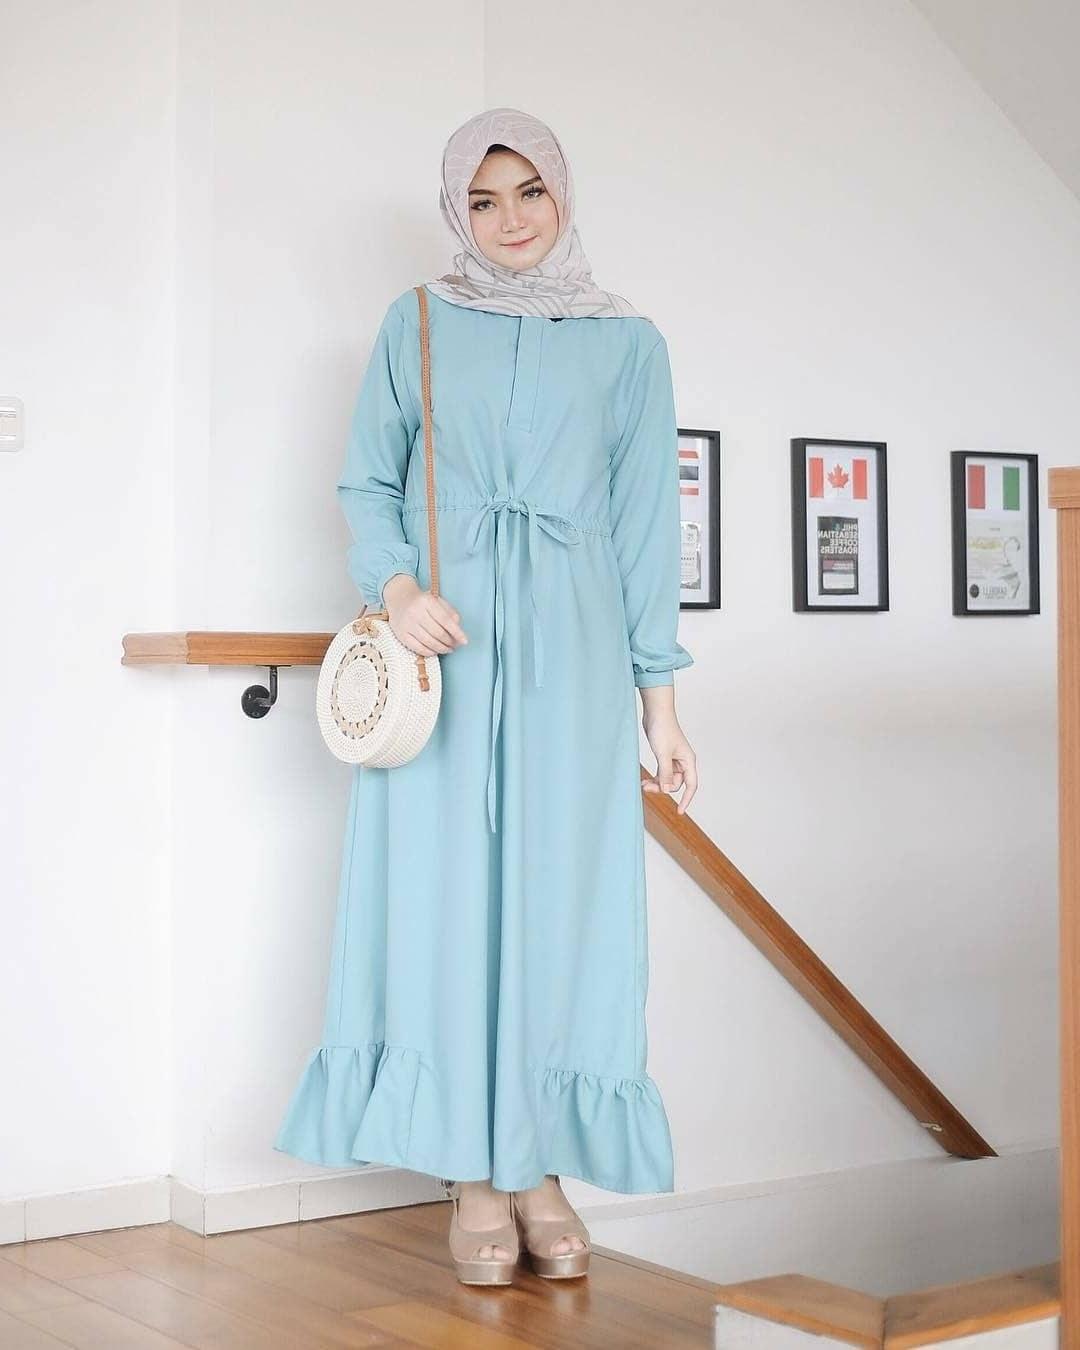 Bentuk Baju Lebaran 2018 Anak Perempuan Ipdd Tren Busana Muslim Terbaru Untuk Merayakan Hari Raya Yang